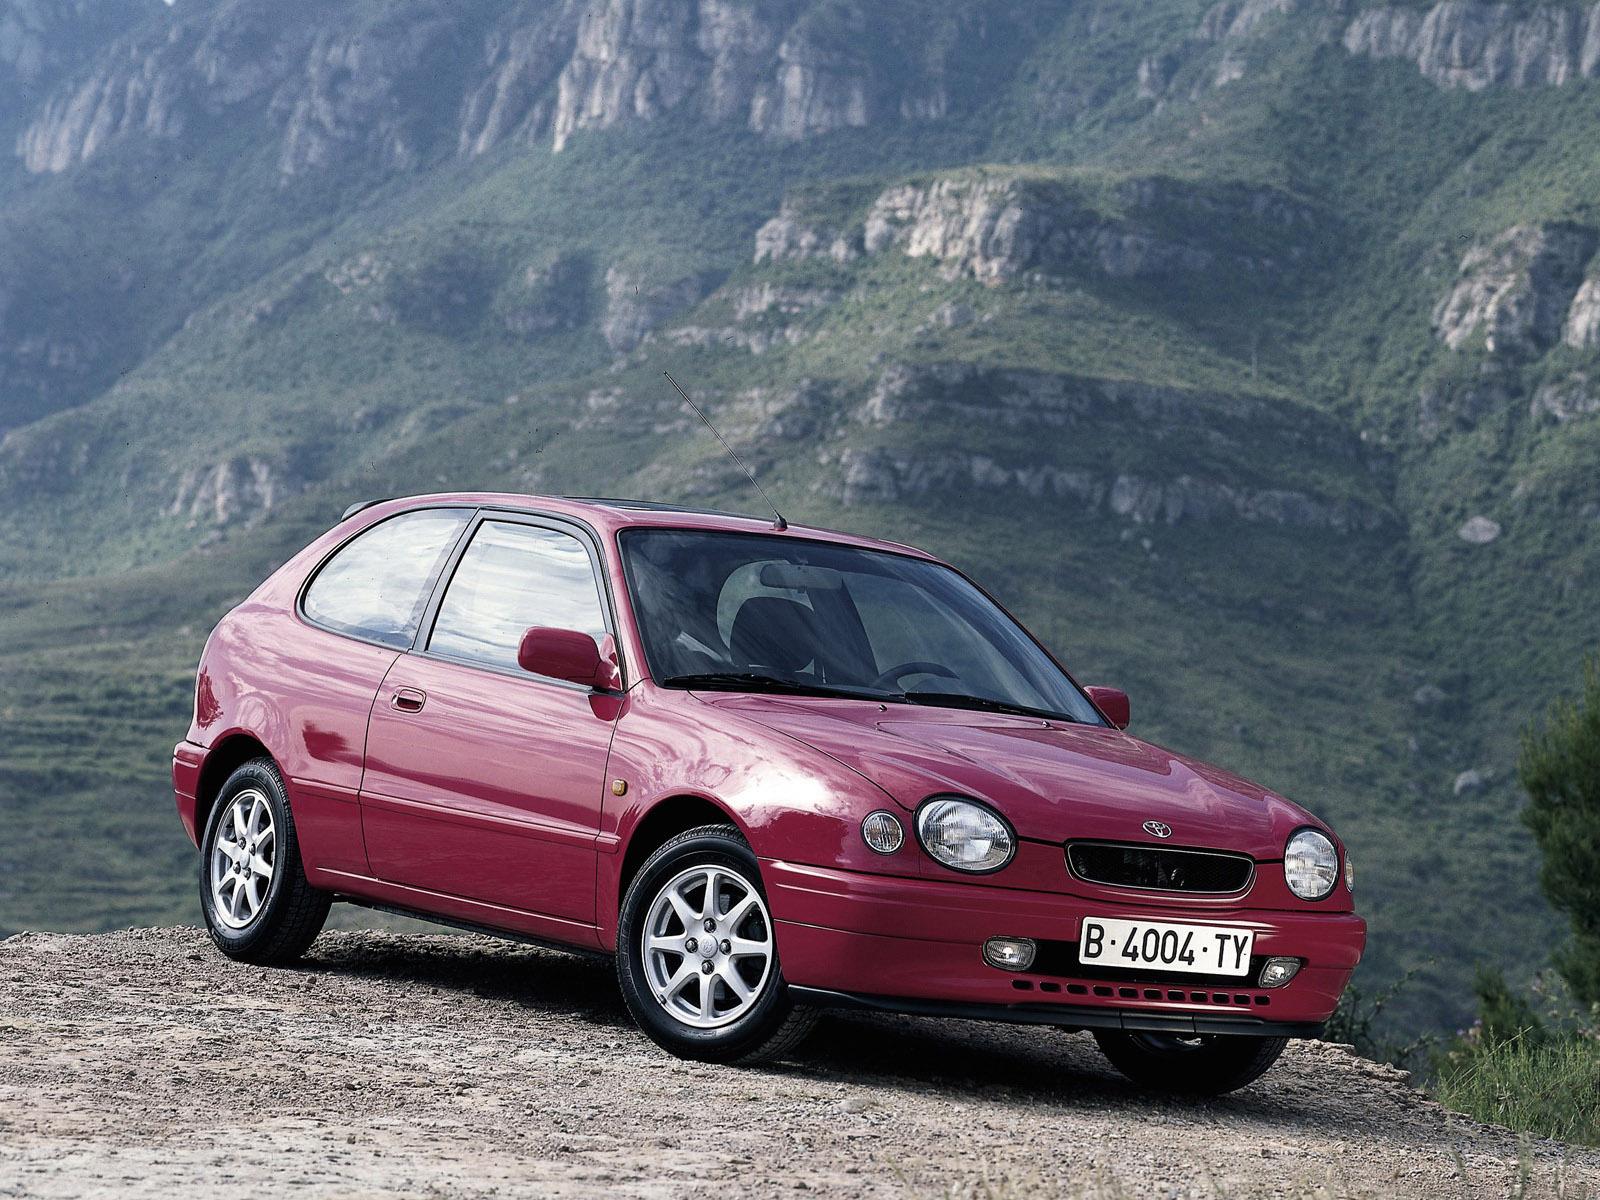 toyota_corolla-compact-3-door-e110-1997-99_r1_jpg.jpg